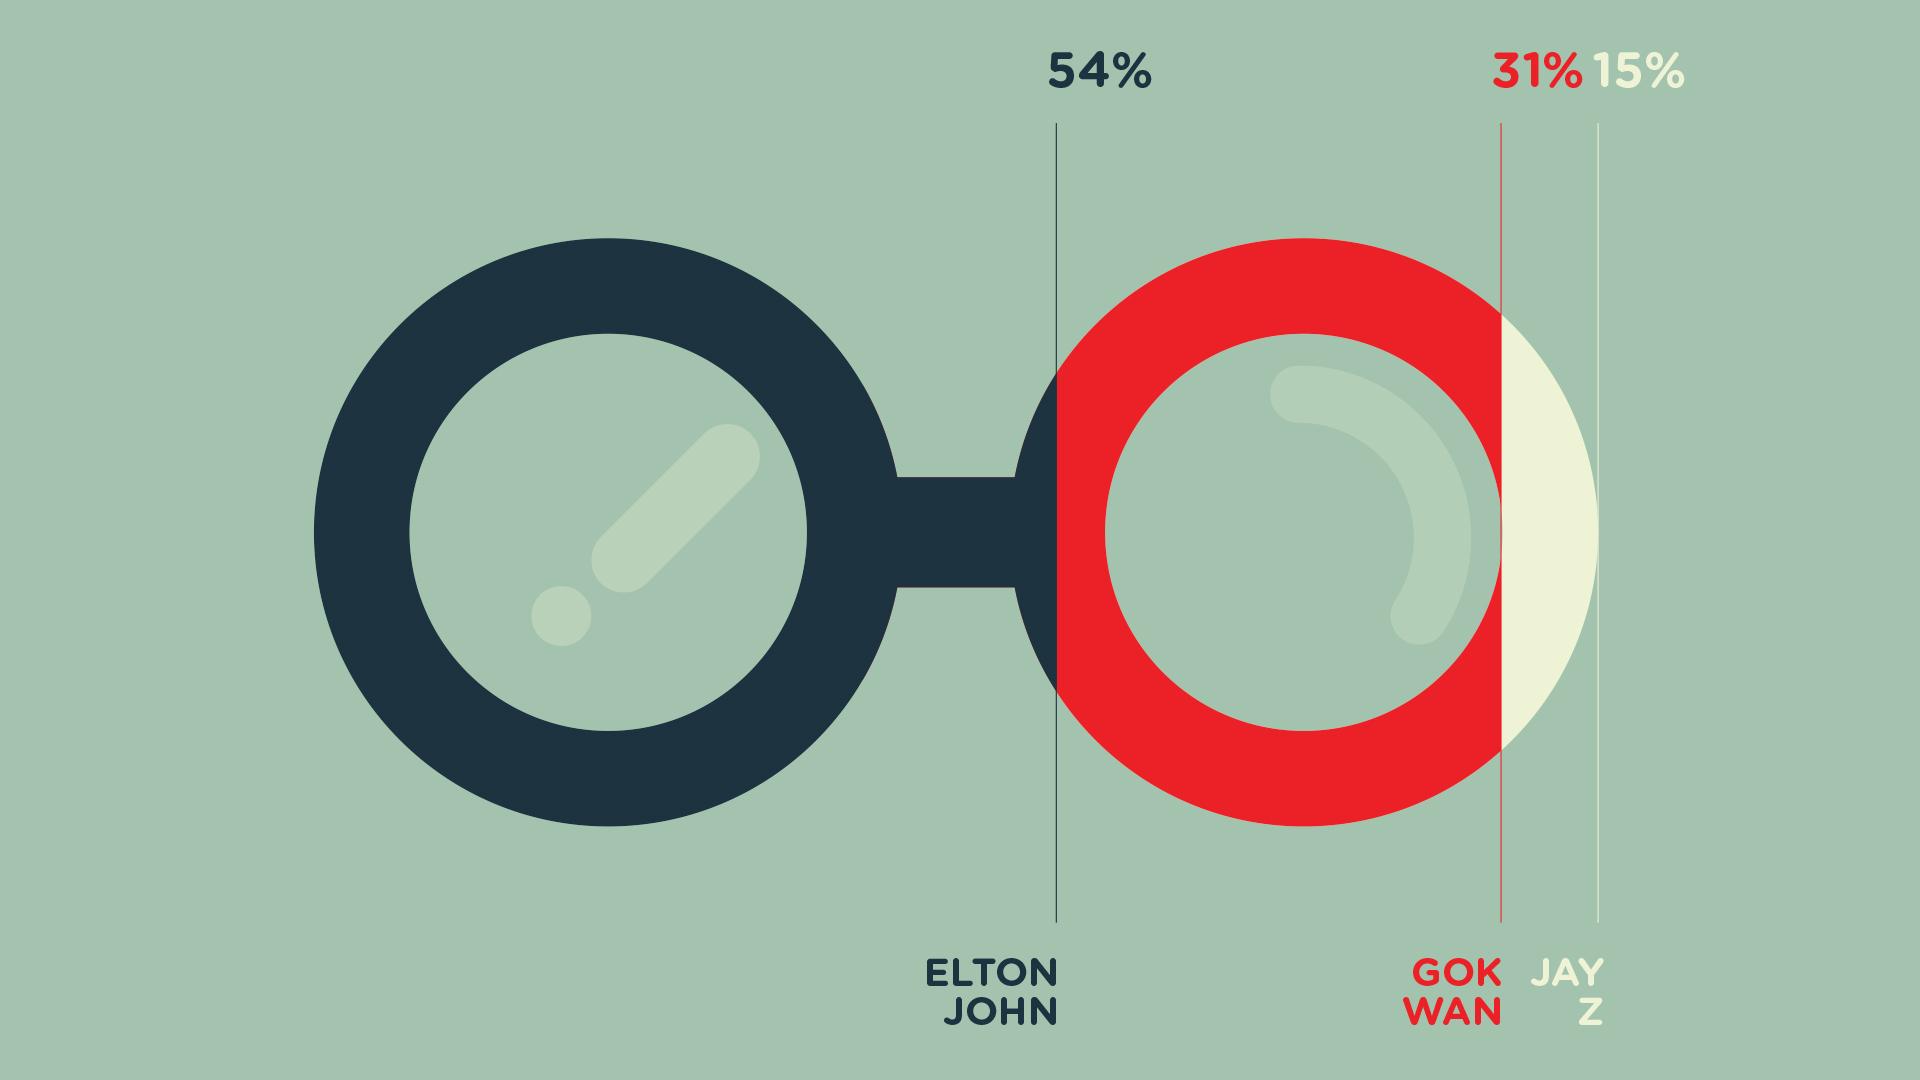 IDKT-about-Elton-John---Young-Illustration-&-Animation-Studio-Manchester-2D,-MOTION-GRAPHICS,-INFOGRAPHICS,elton,specsavers,-glasses,-gok-wan,-jay-z,,-graph,-shares.jpg